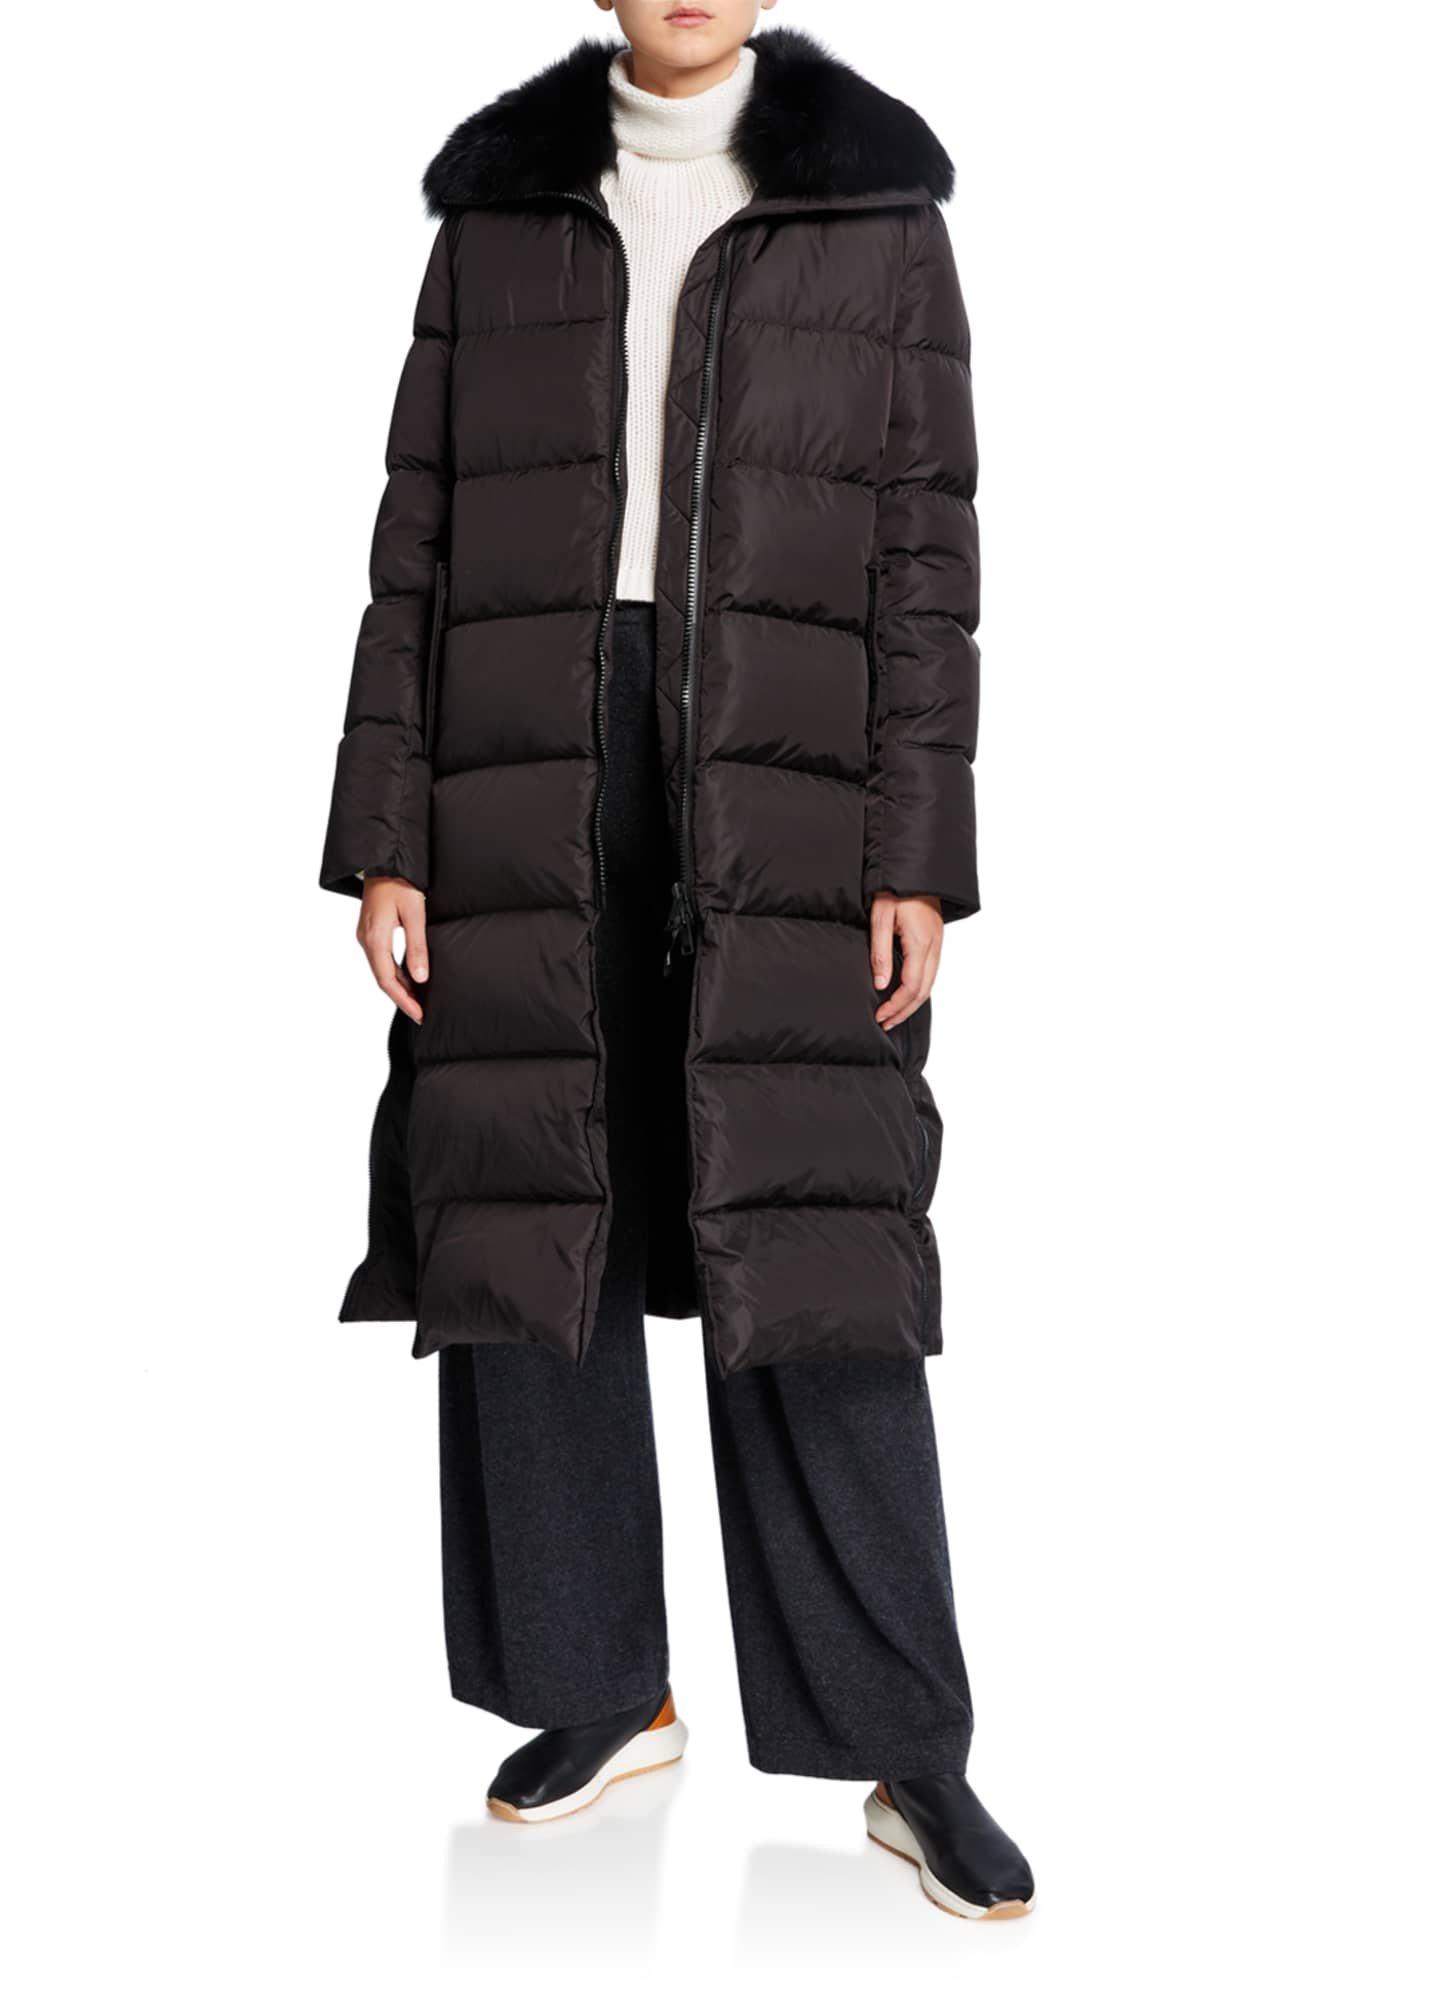 Army By Yves Salomon Long Side-Zip Puffer Coat